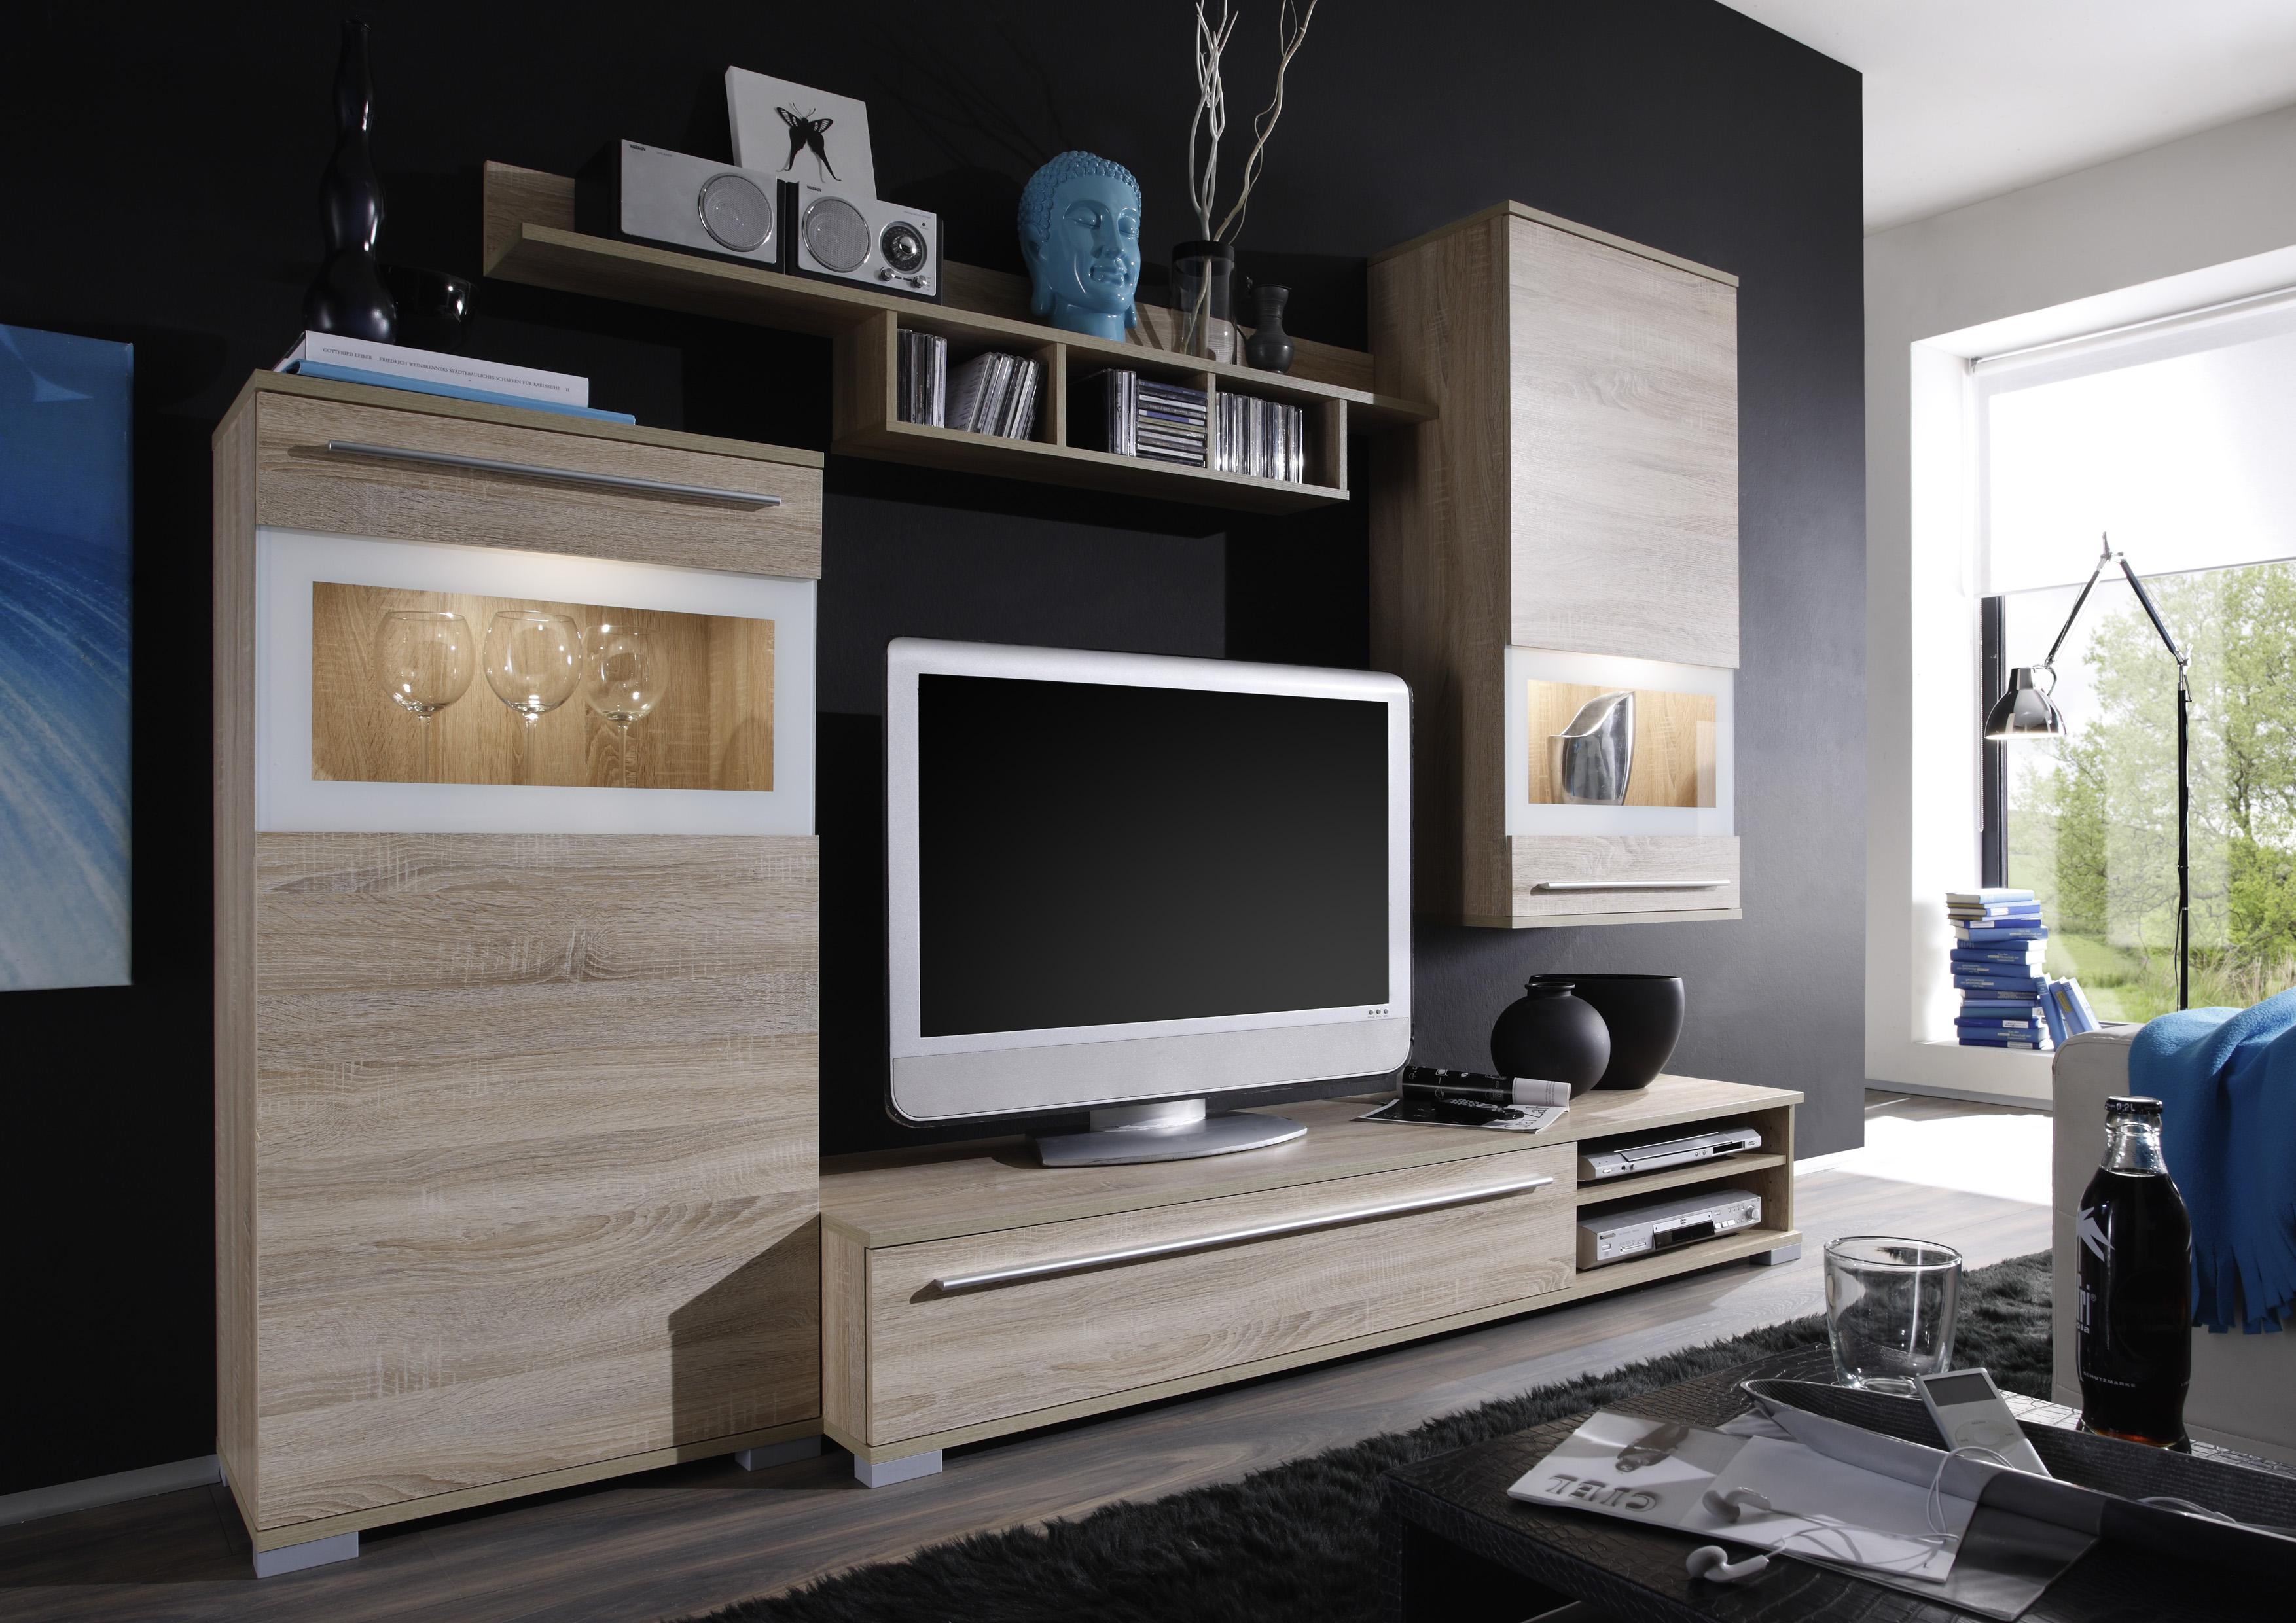 jam wohnwand eiche sonoma weiss 289 b2b trade. Black Bedroom Furniture Sets. Home Design Ideas